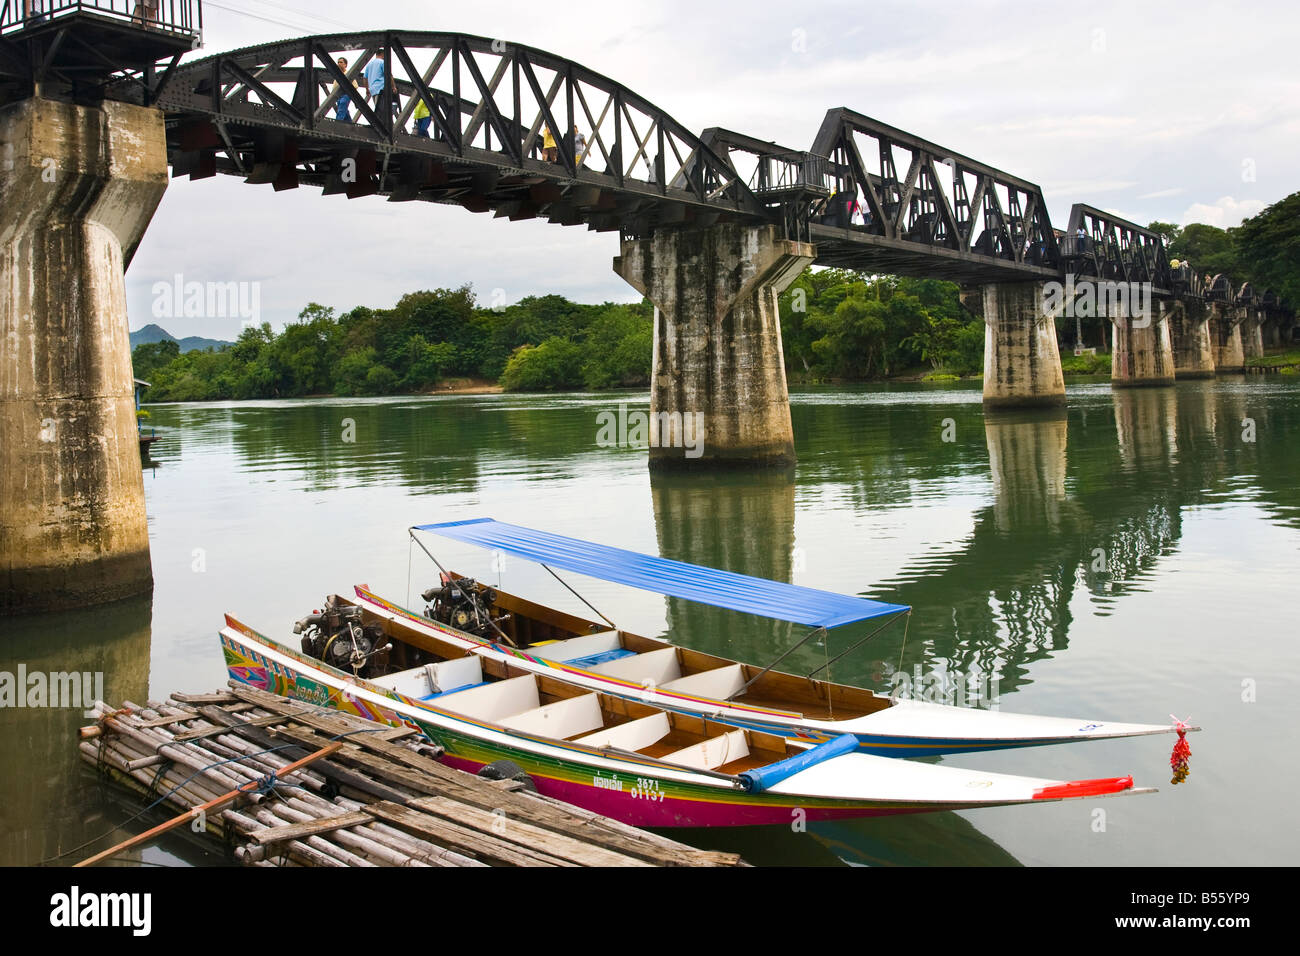 Bridge over the River Kwai, Pakkred Nonthaburi, Kanchanburi, Thailand, - Stock Image